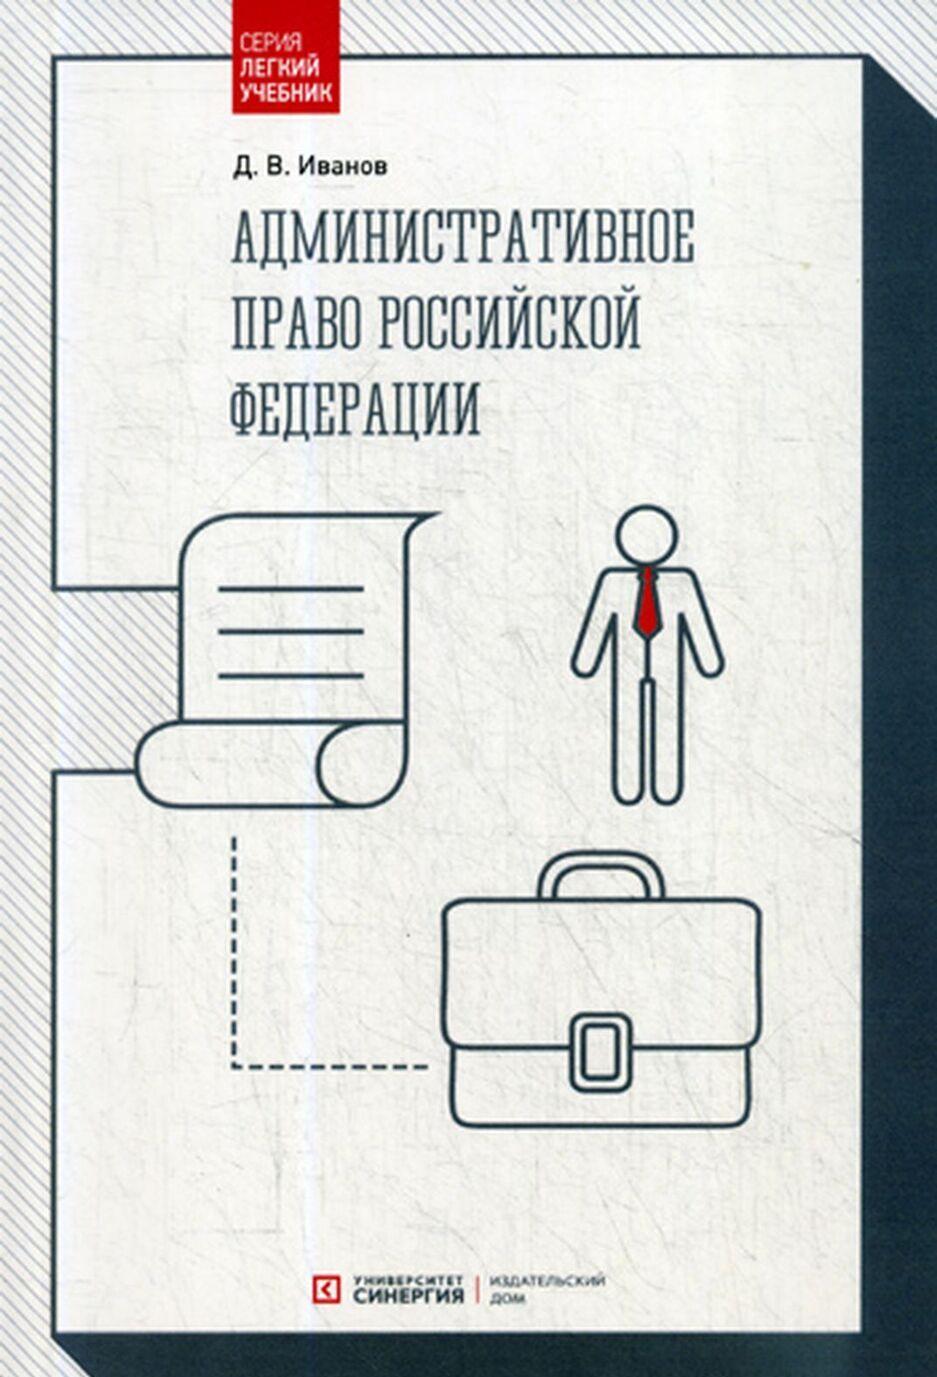 Administrativnoe pravo Rossijskoj Federatsii. Uchebnik | Ivanov Dmitrij Vladimirovich